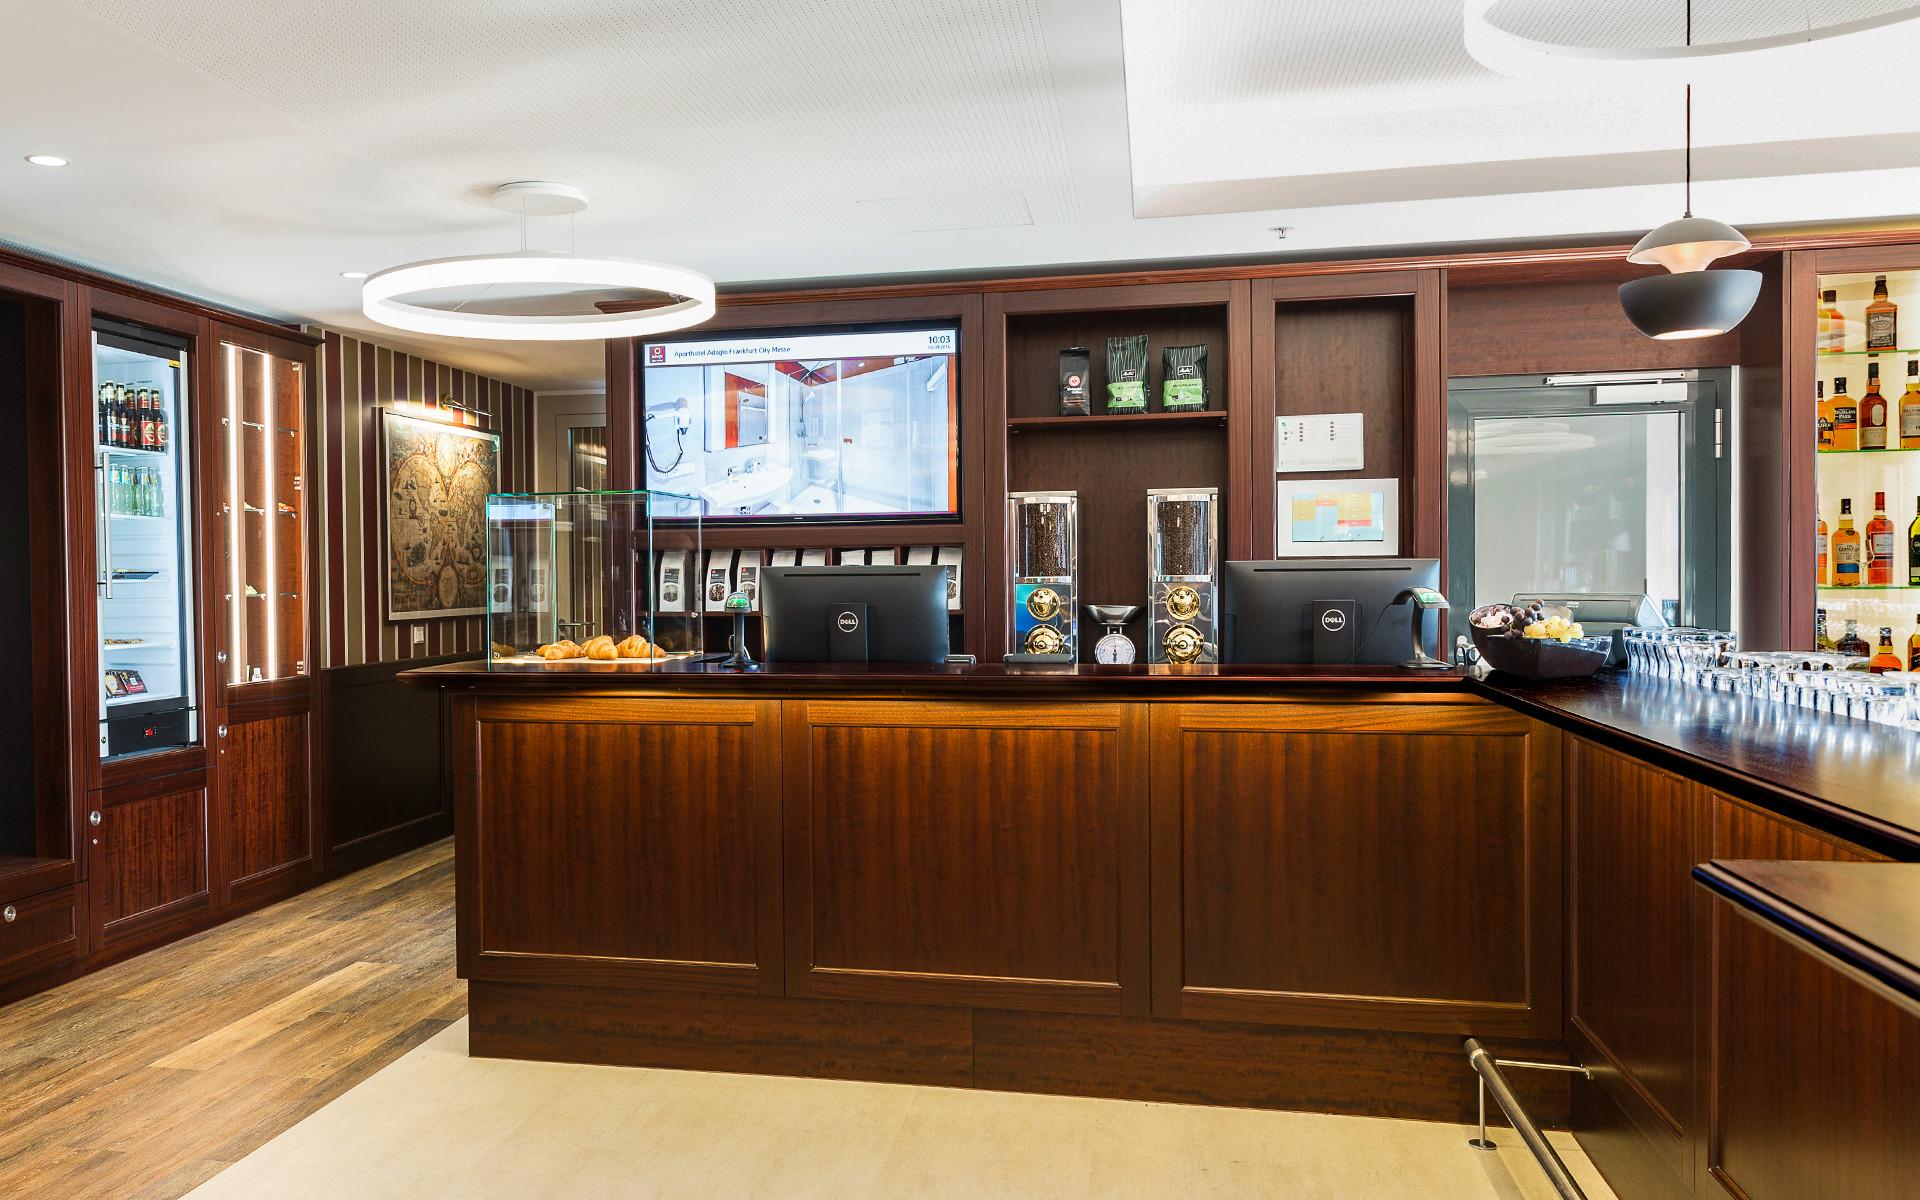 Hotels In Magdeburg Nahe Bahnhof